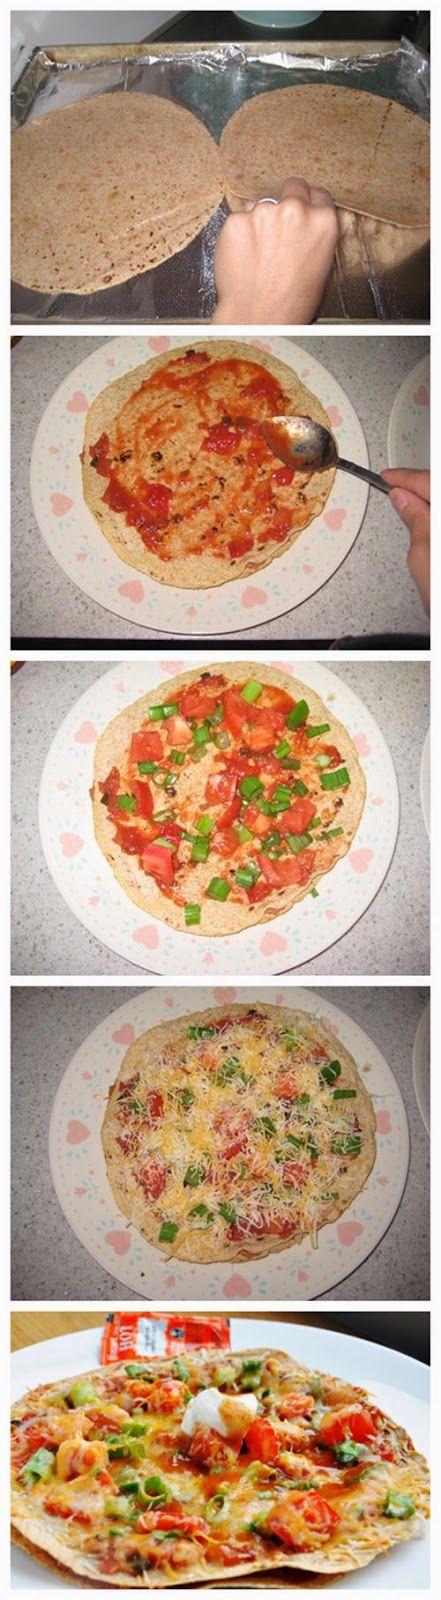 mexican tortilla pizza - Truelifekitchen